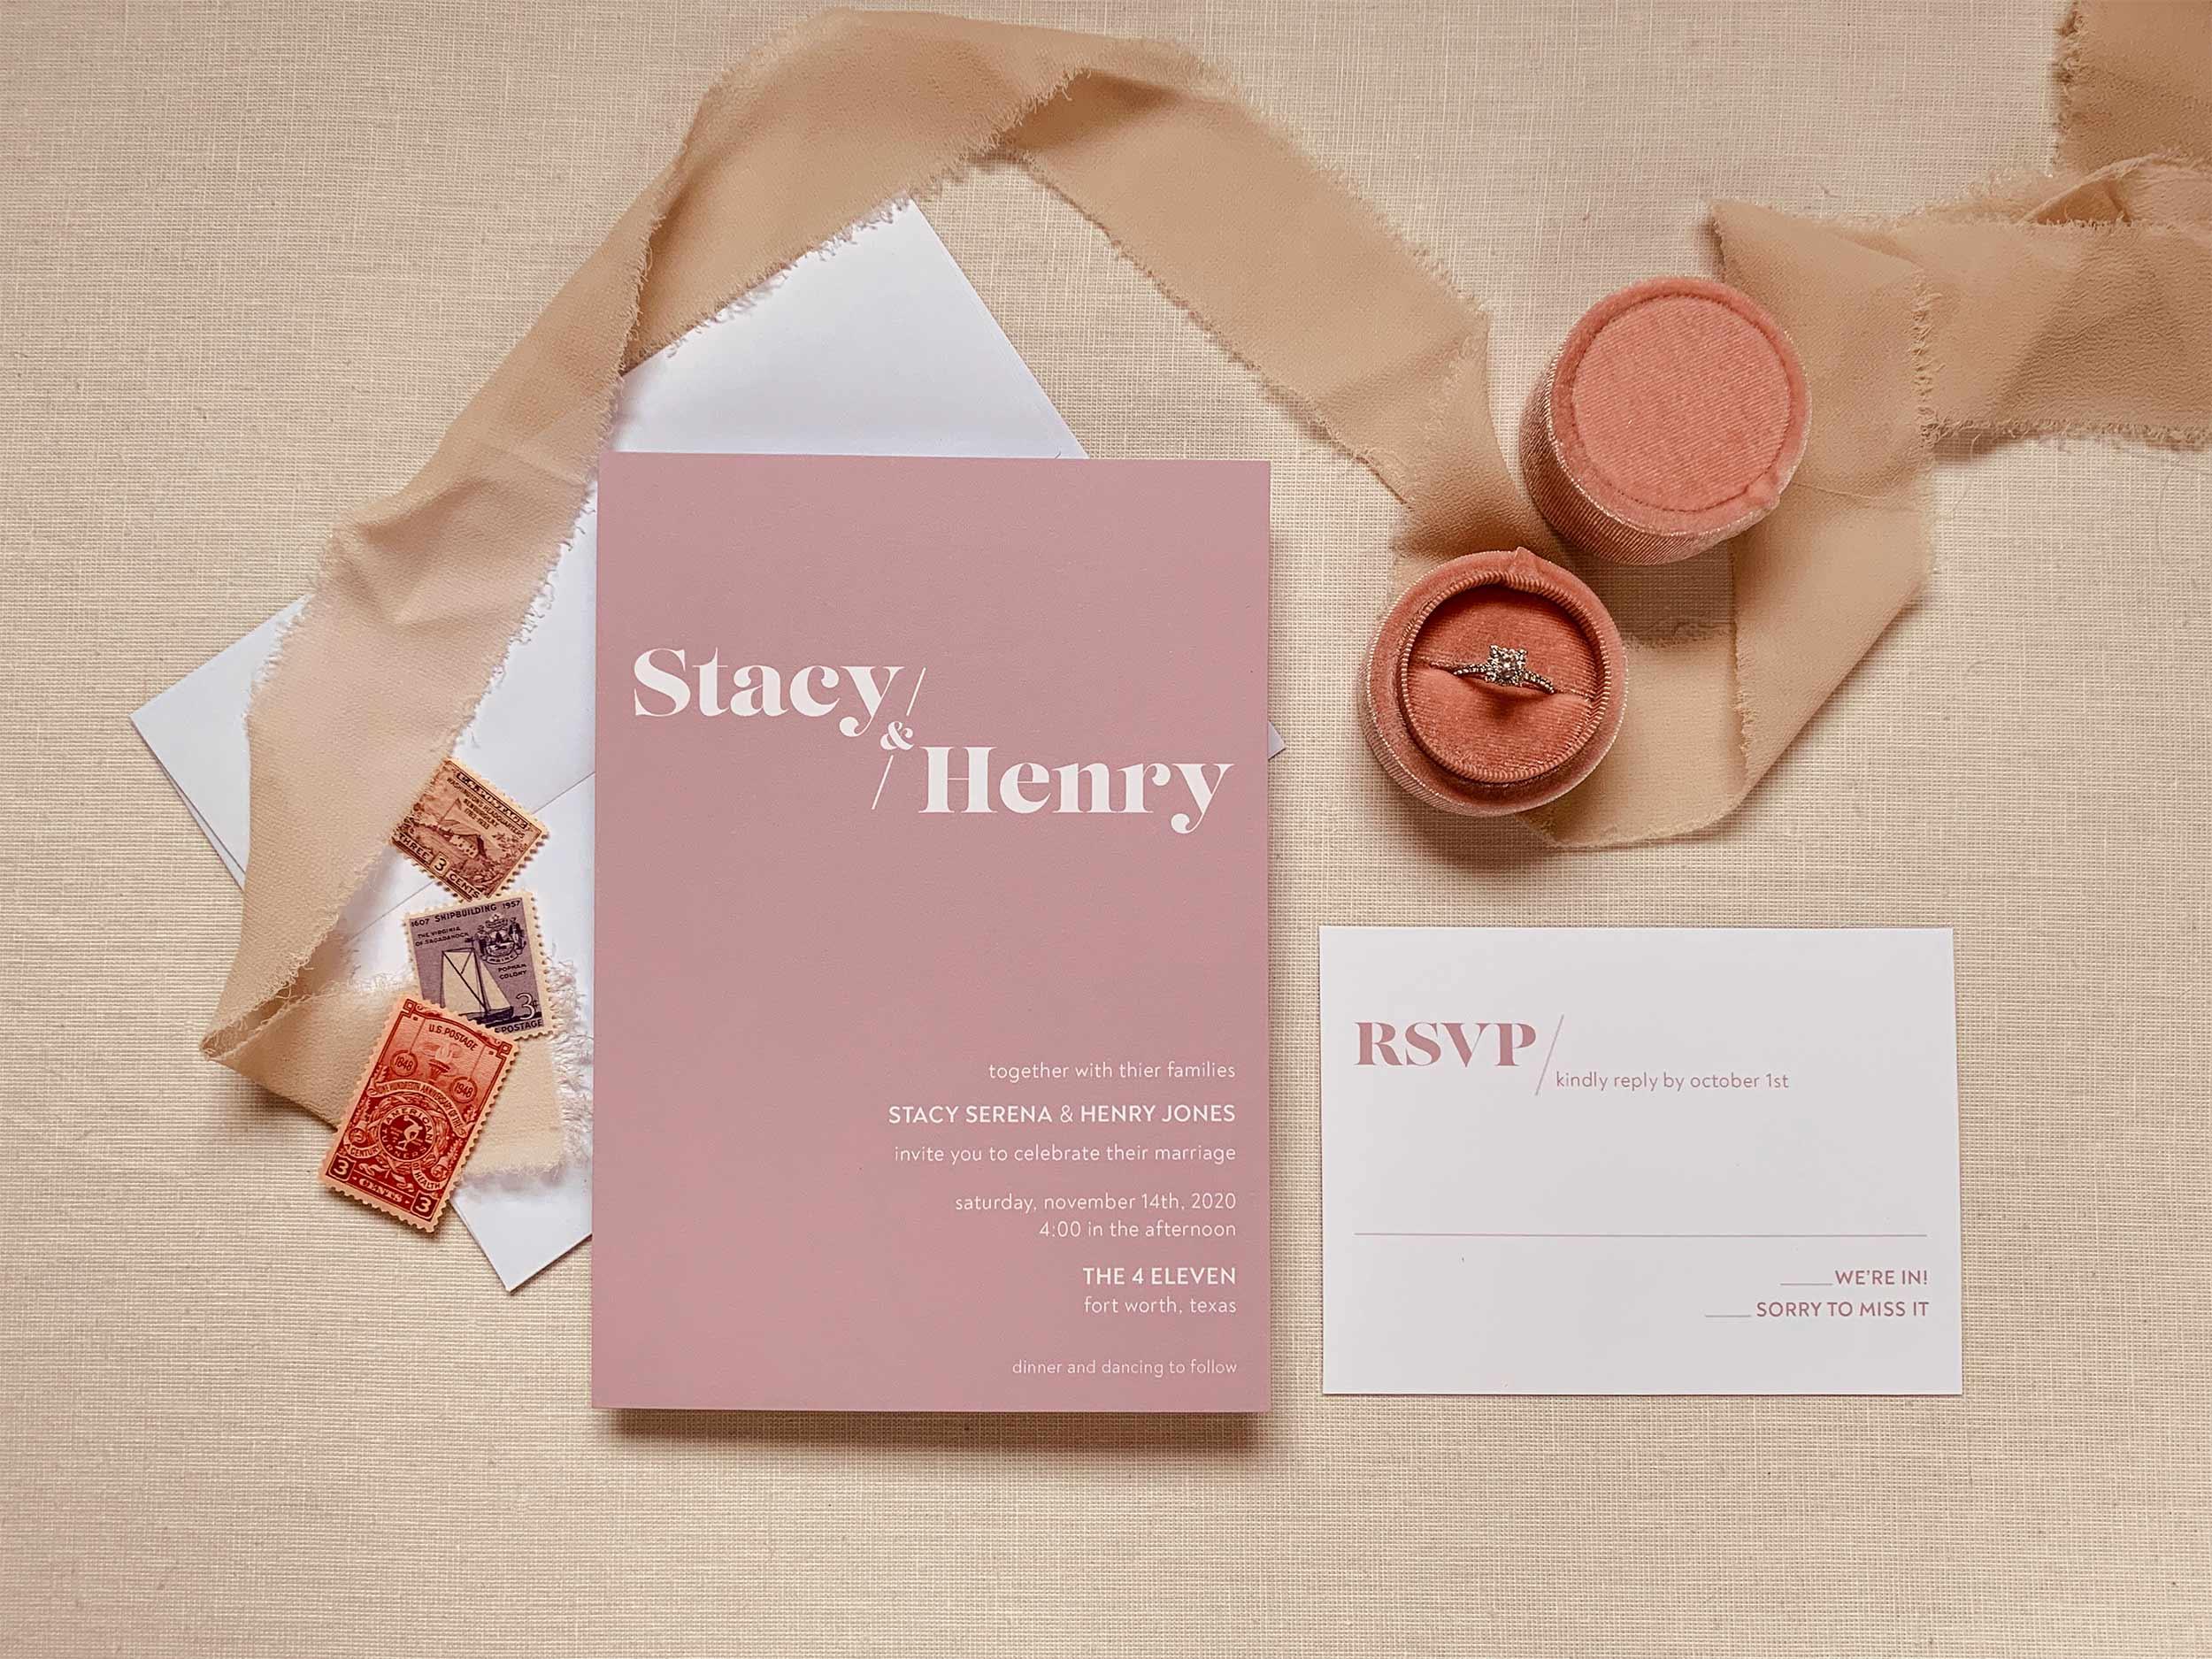 Sandy-Ngo---Stacy---Home-Page.jpg